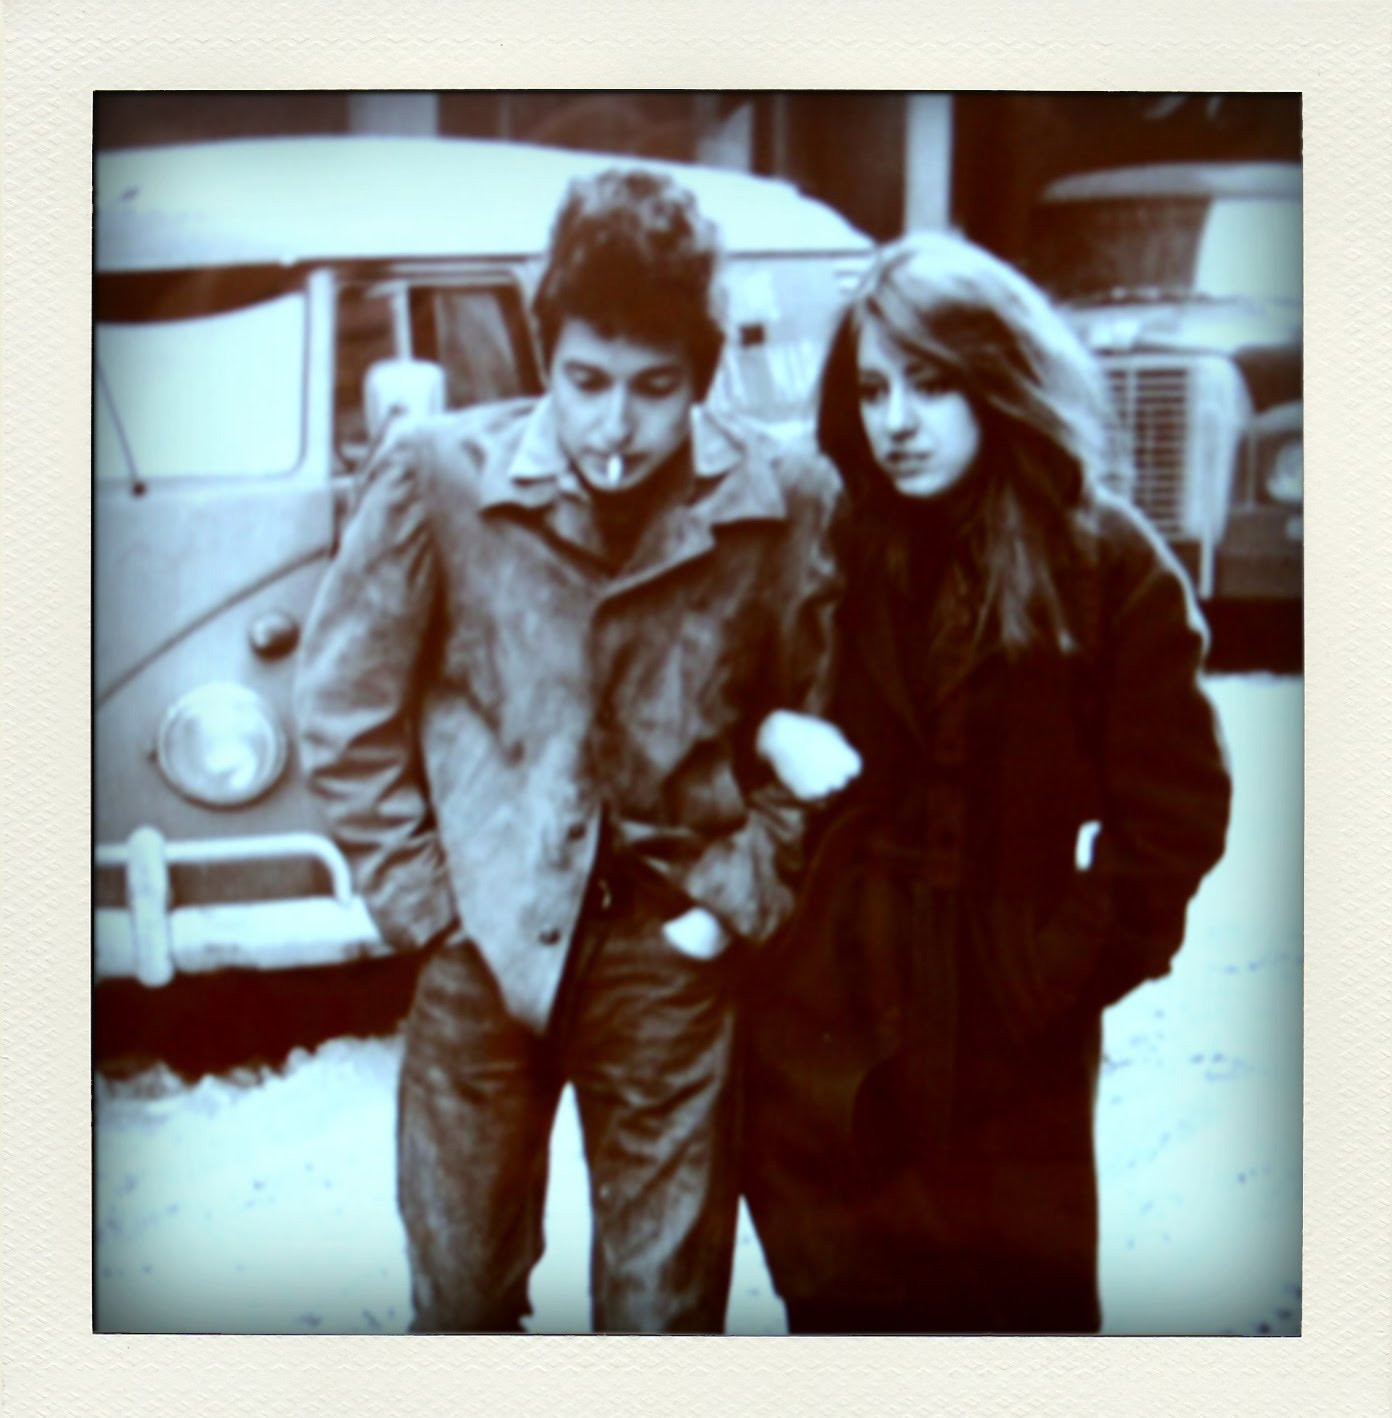 http://1.bp.blogspot.com/_yavP5M_4h14/TAKnGY5_F7I/AAAAAAAAAjM/NEX7o1Frbtw/s1600/Bob-Dylan.jpg